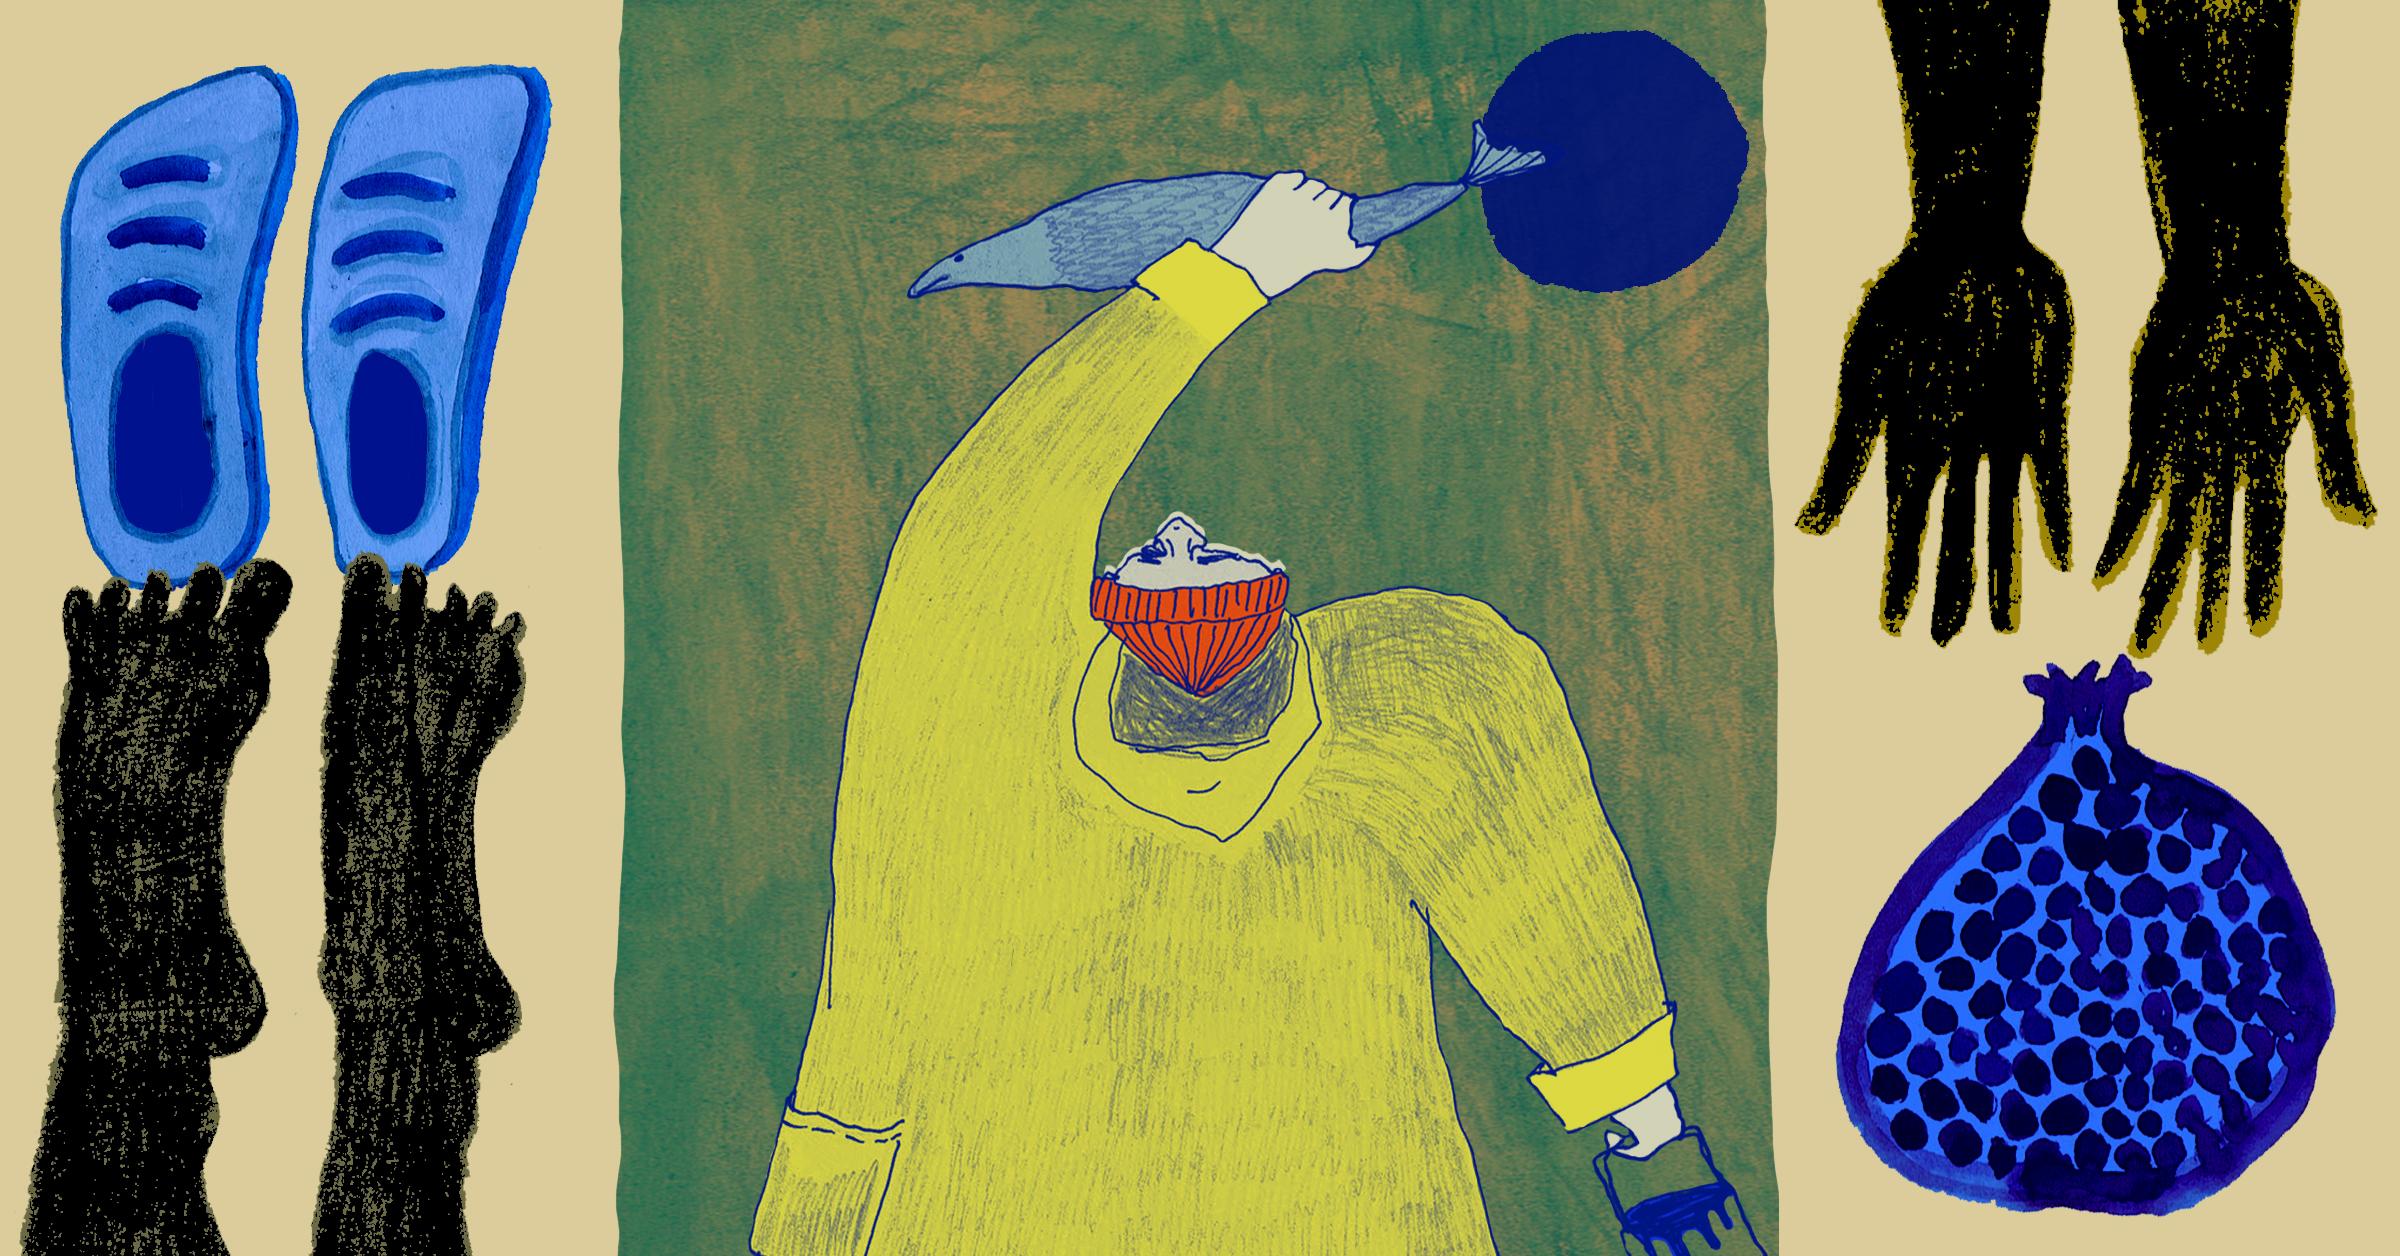 A Poem By Brett Mottram: Fresh Fruit Without The Fishmonger